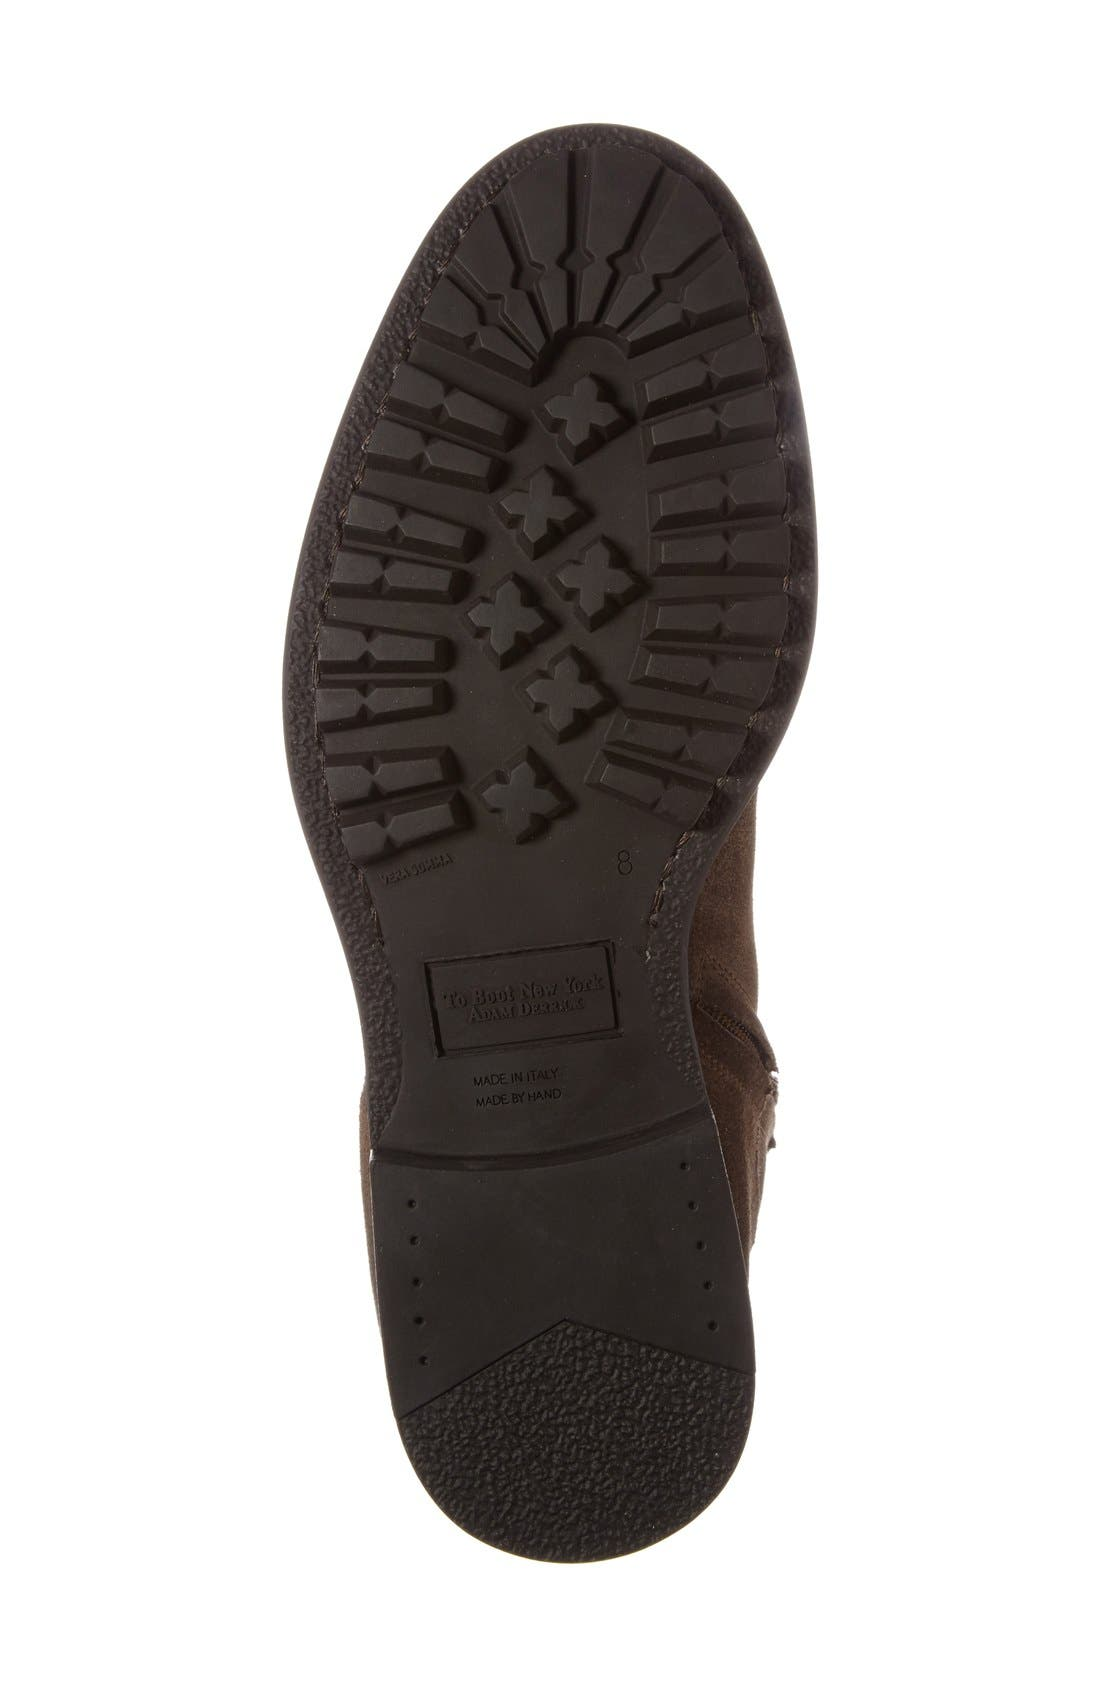 'Harrison' Zip Boot,                             Alternate thumbnail 4, color,                             Brown